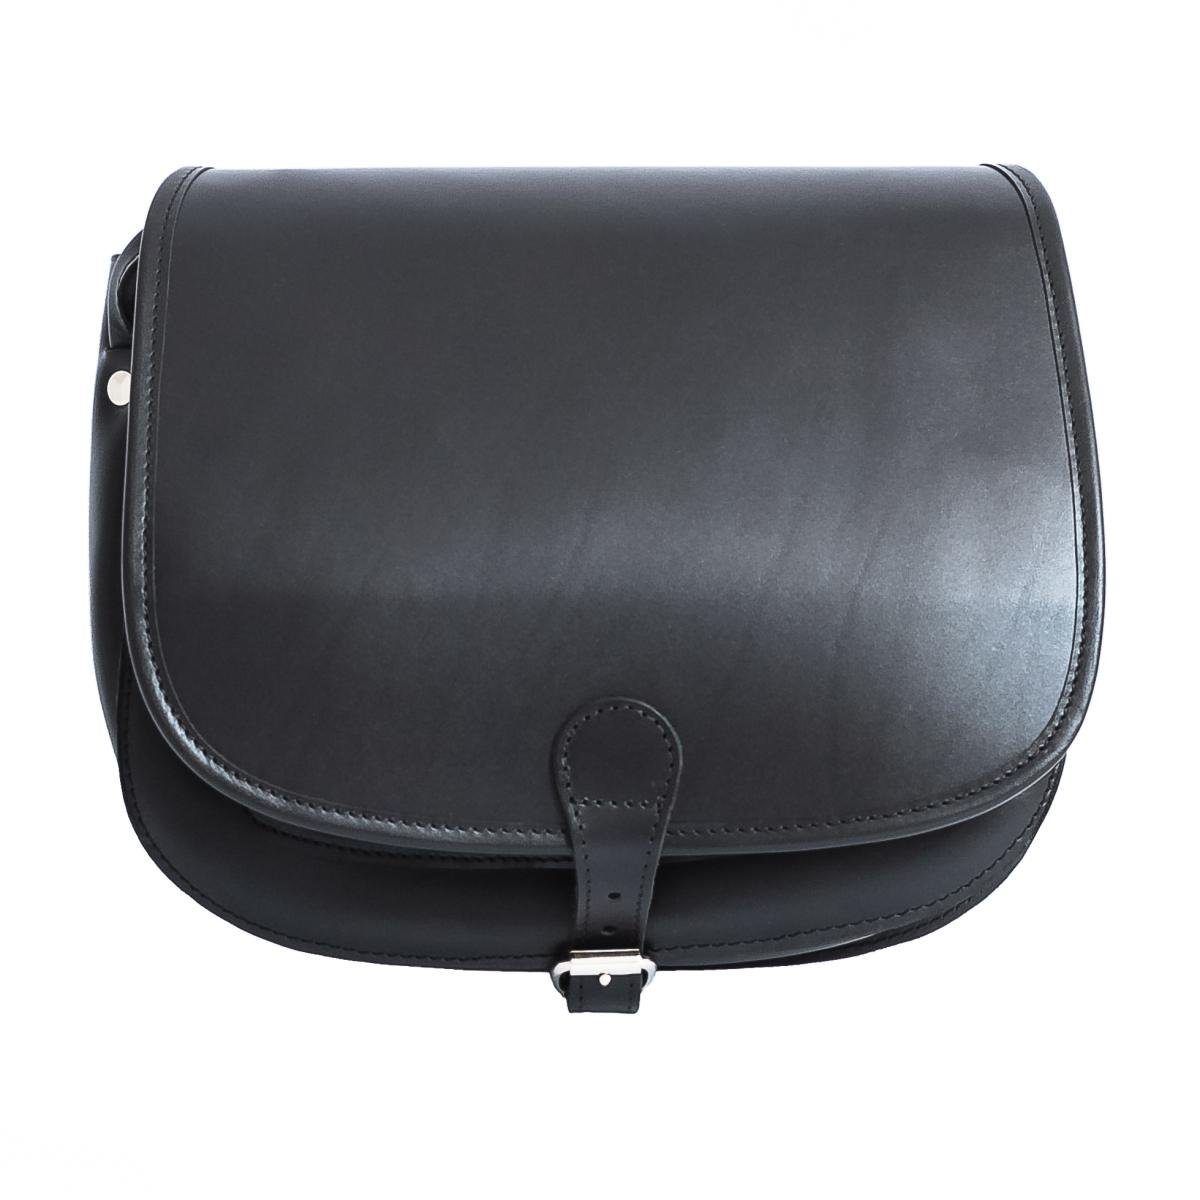 1f8b7f3e0 Black 11 Inches Leather Womens Saddle Bag | Hunters Handbag | Vegetable  Tanned Satchel Crossbody Bag: Amazon.co.uk: Luggage